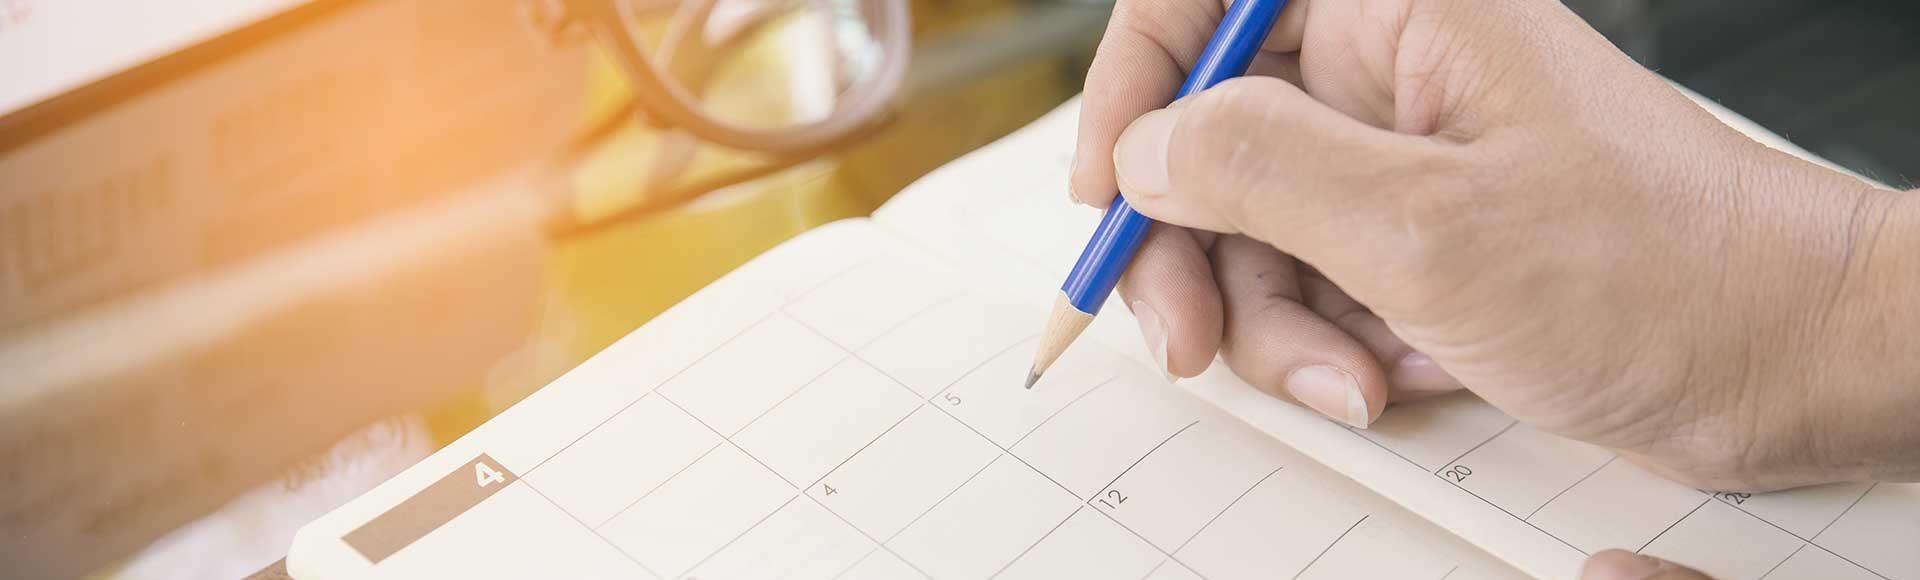 Wochenprogramm Shutterstock 1